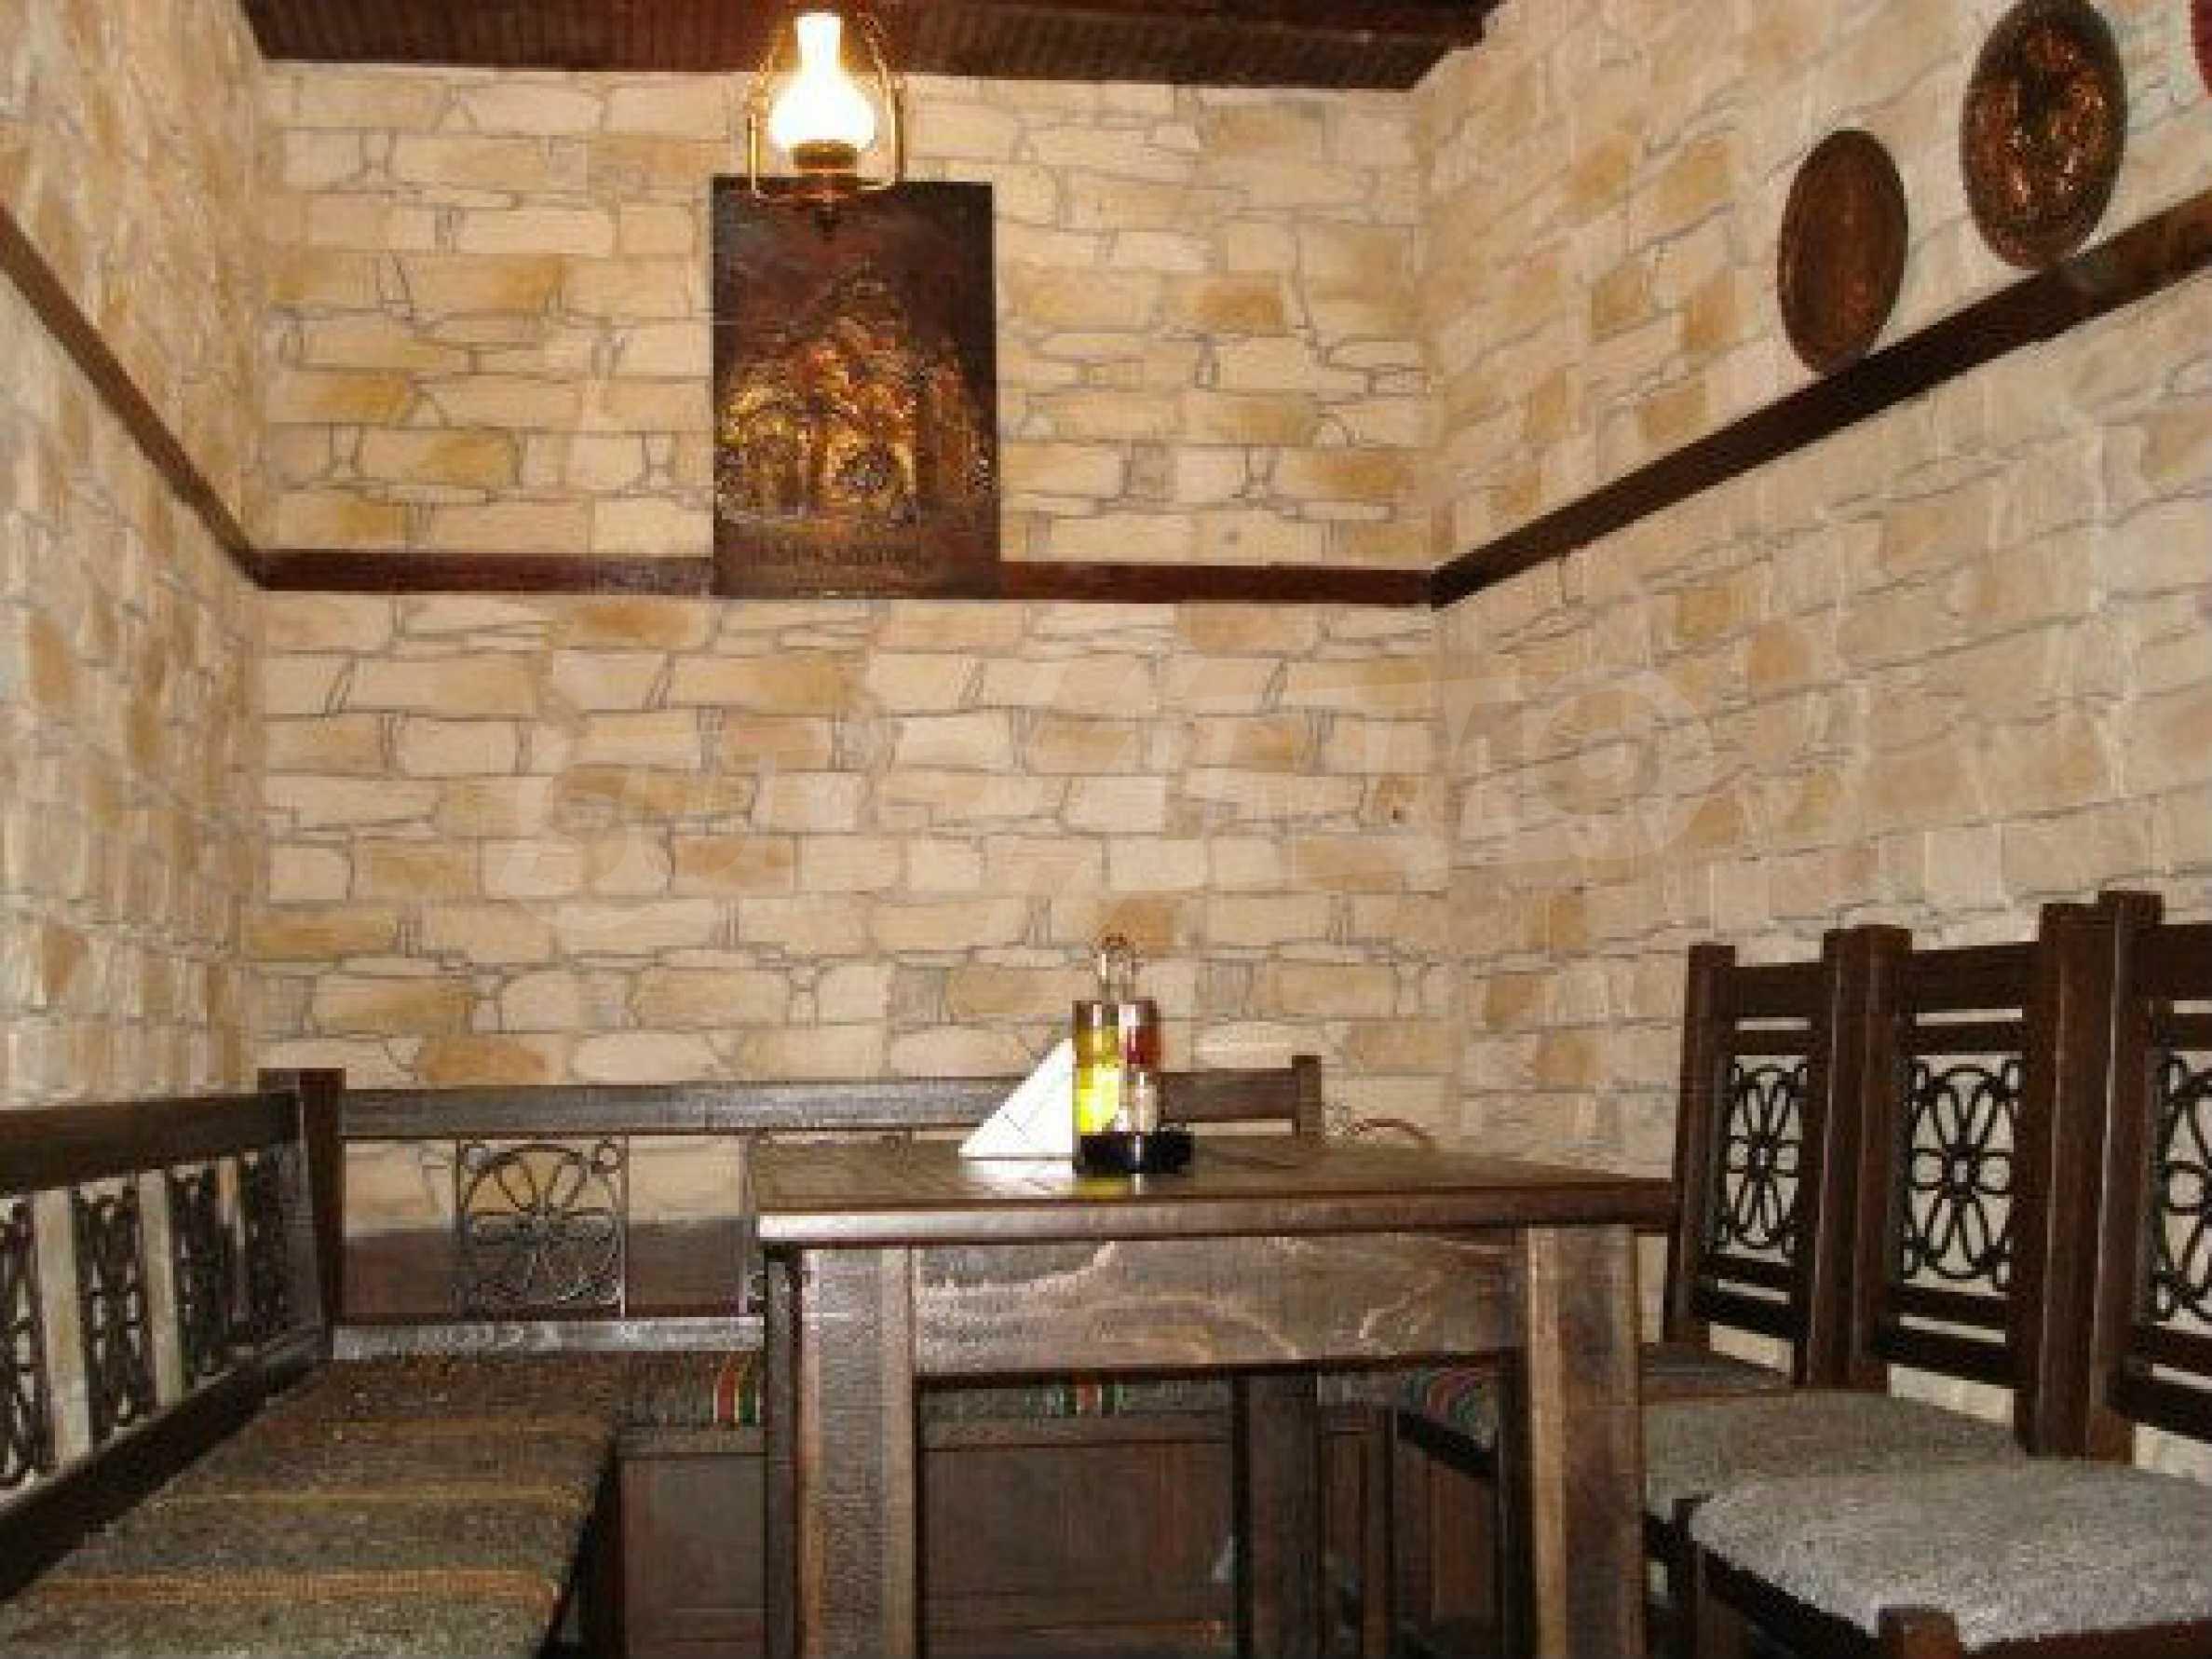 Hotelanlage mit Restaurant am Ufer des Flusses Osam in Lovech 58